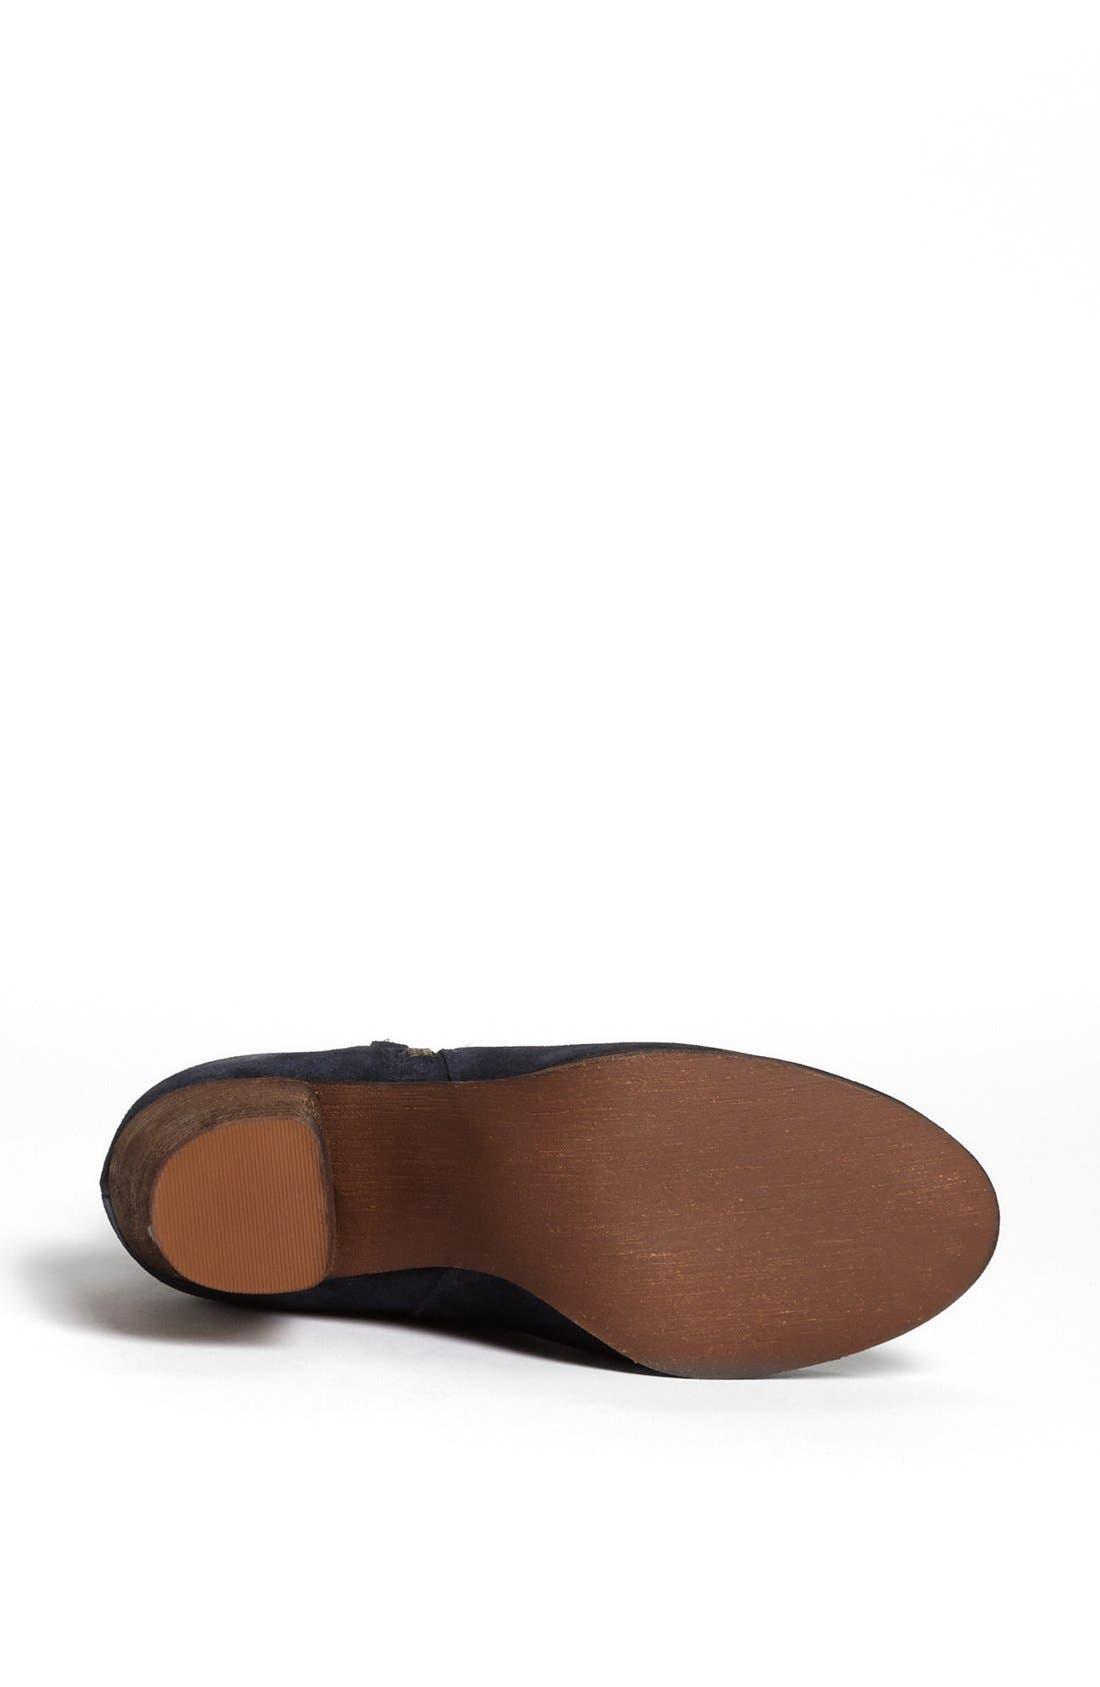 Alternate Image 4  - BP. 'Trolley' Suede Ankle Boot (Women)